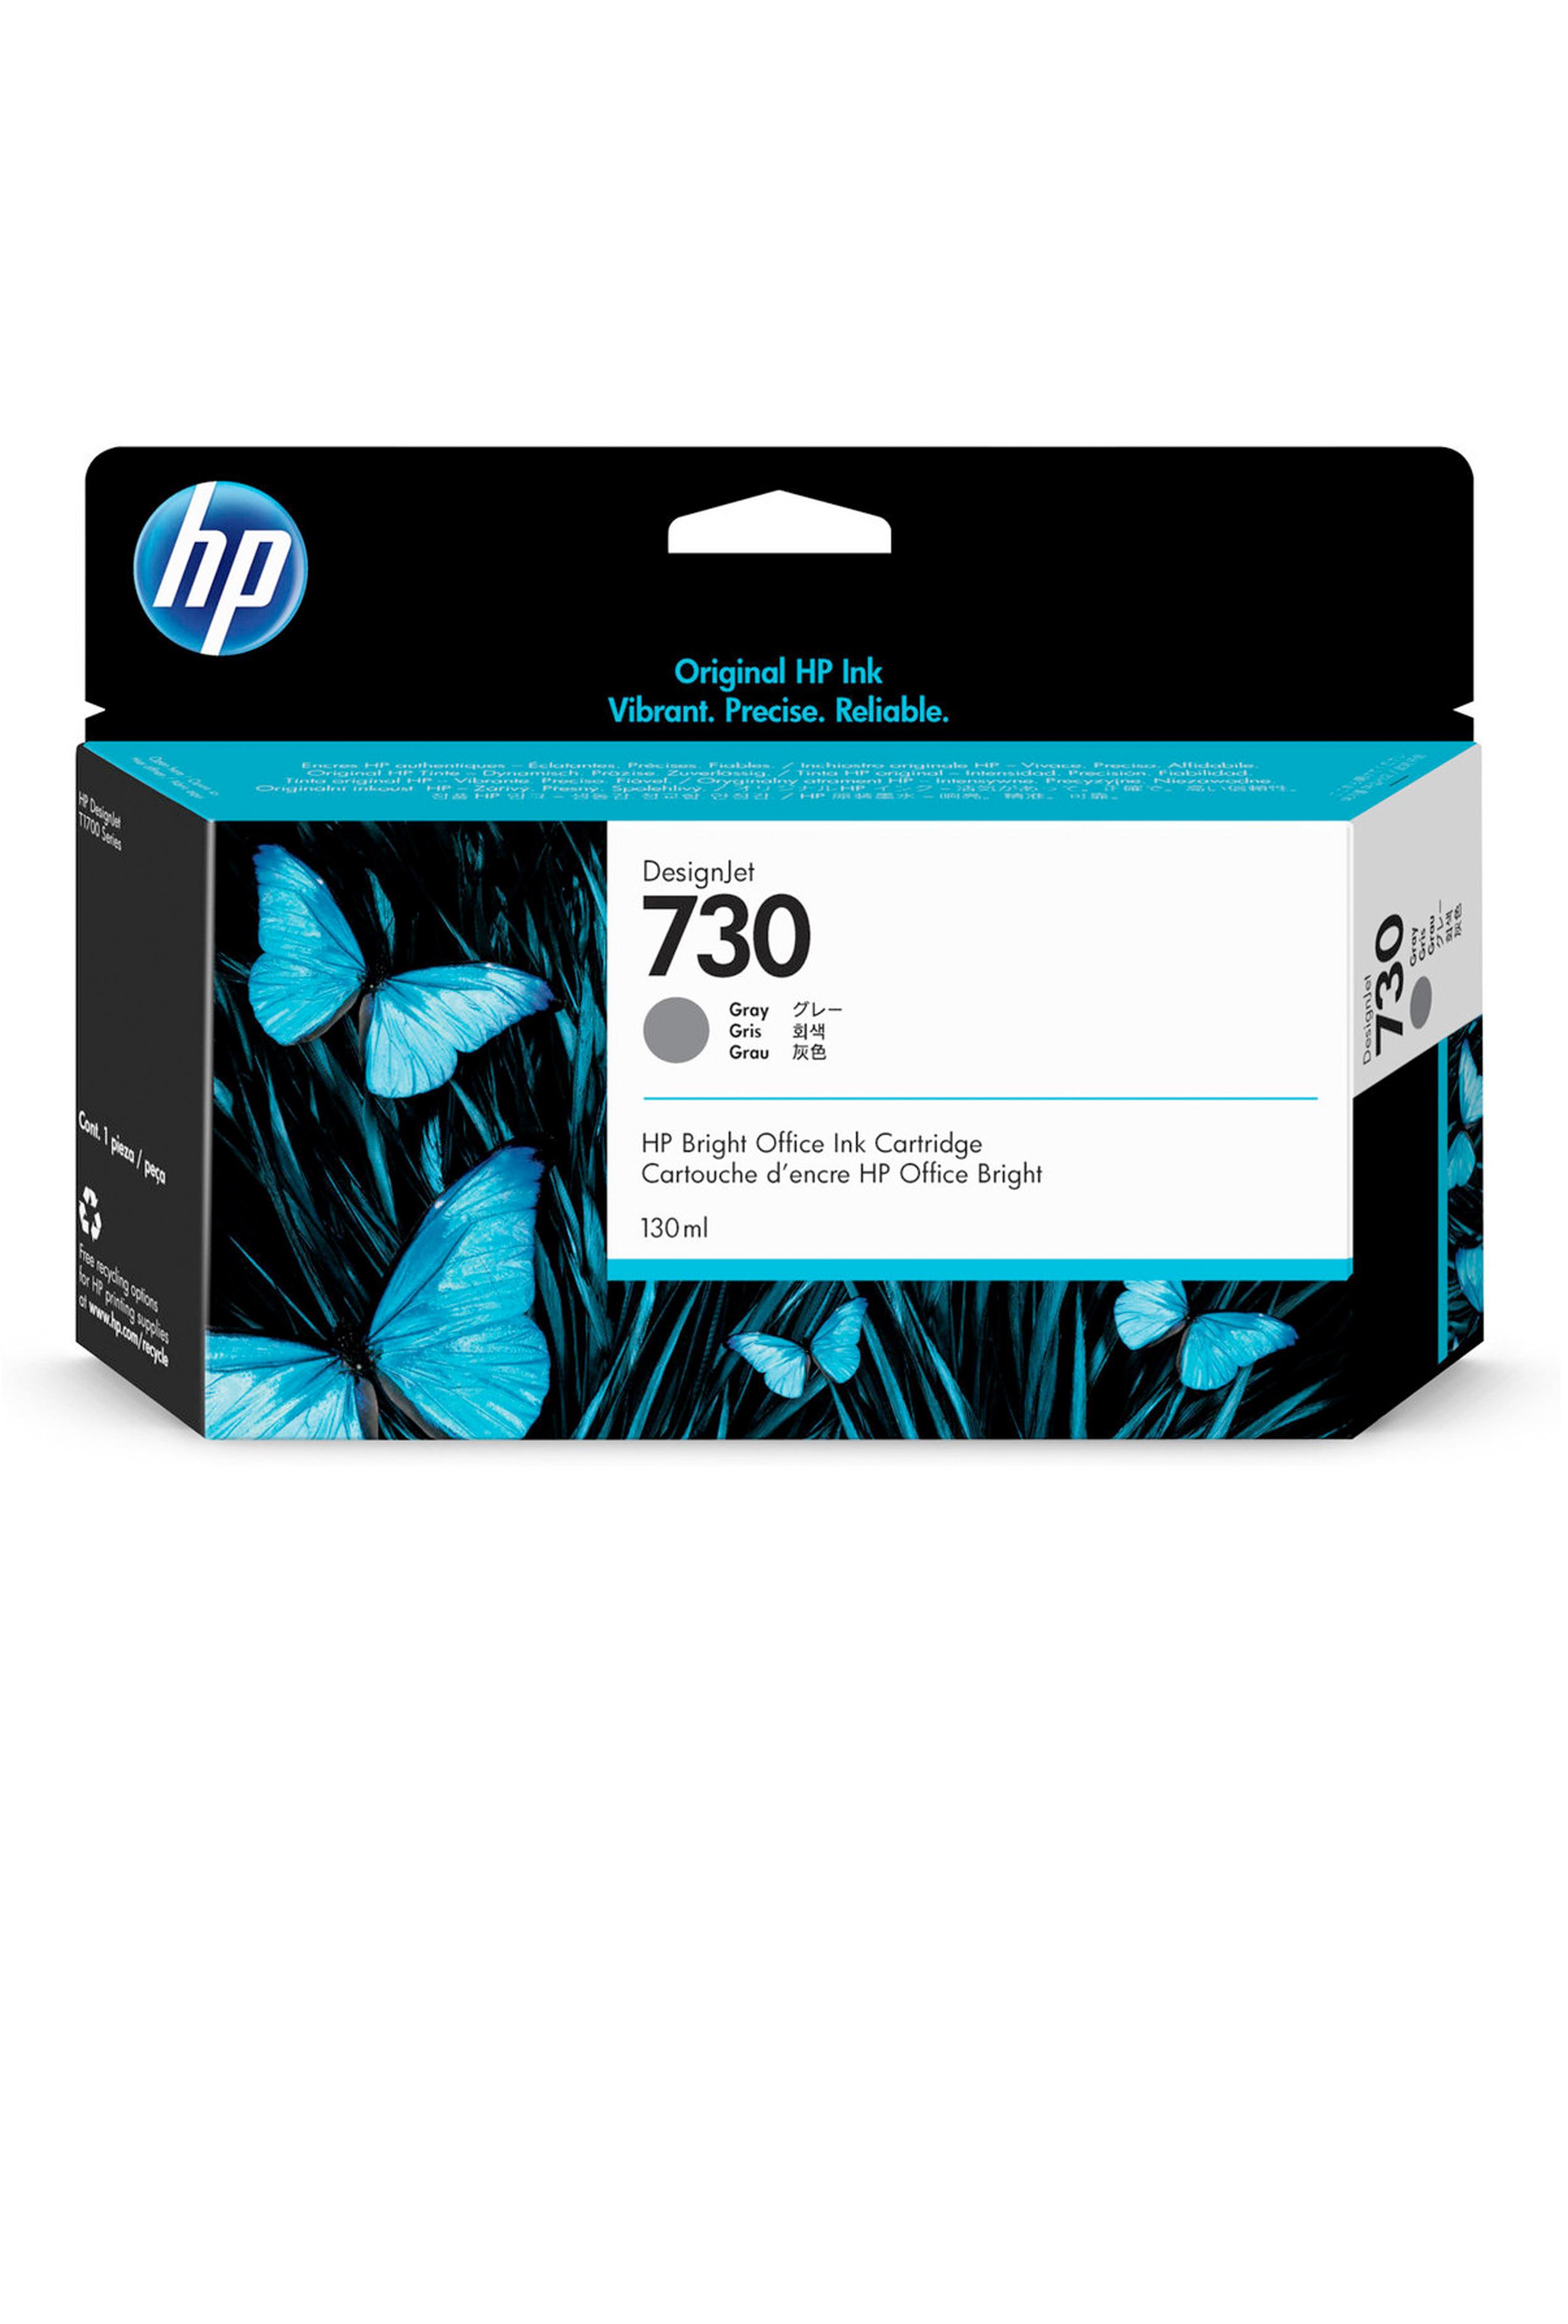 HP 730 DESIGNJET GRAY INK CARTRIDGE (130mil) (P2V66A)